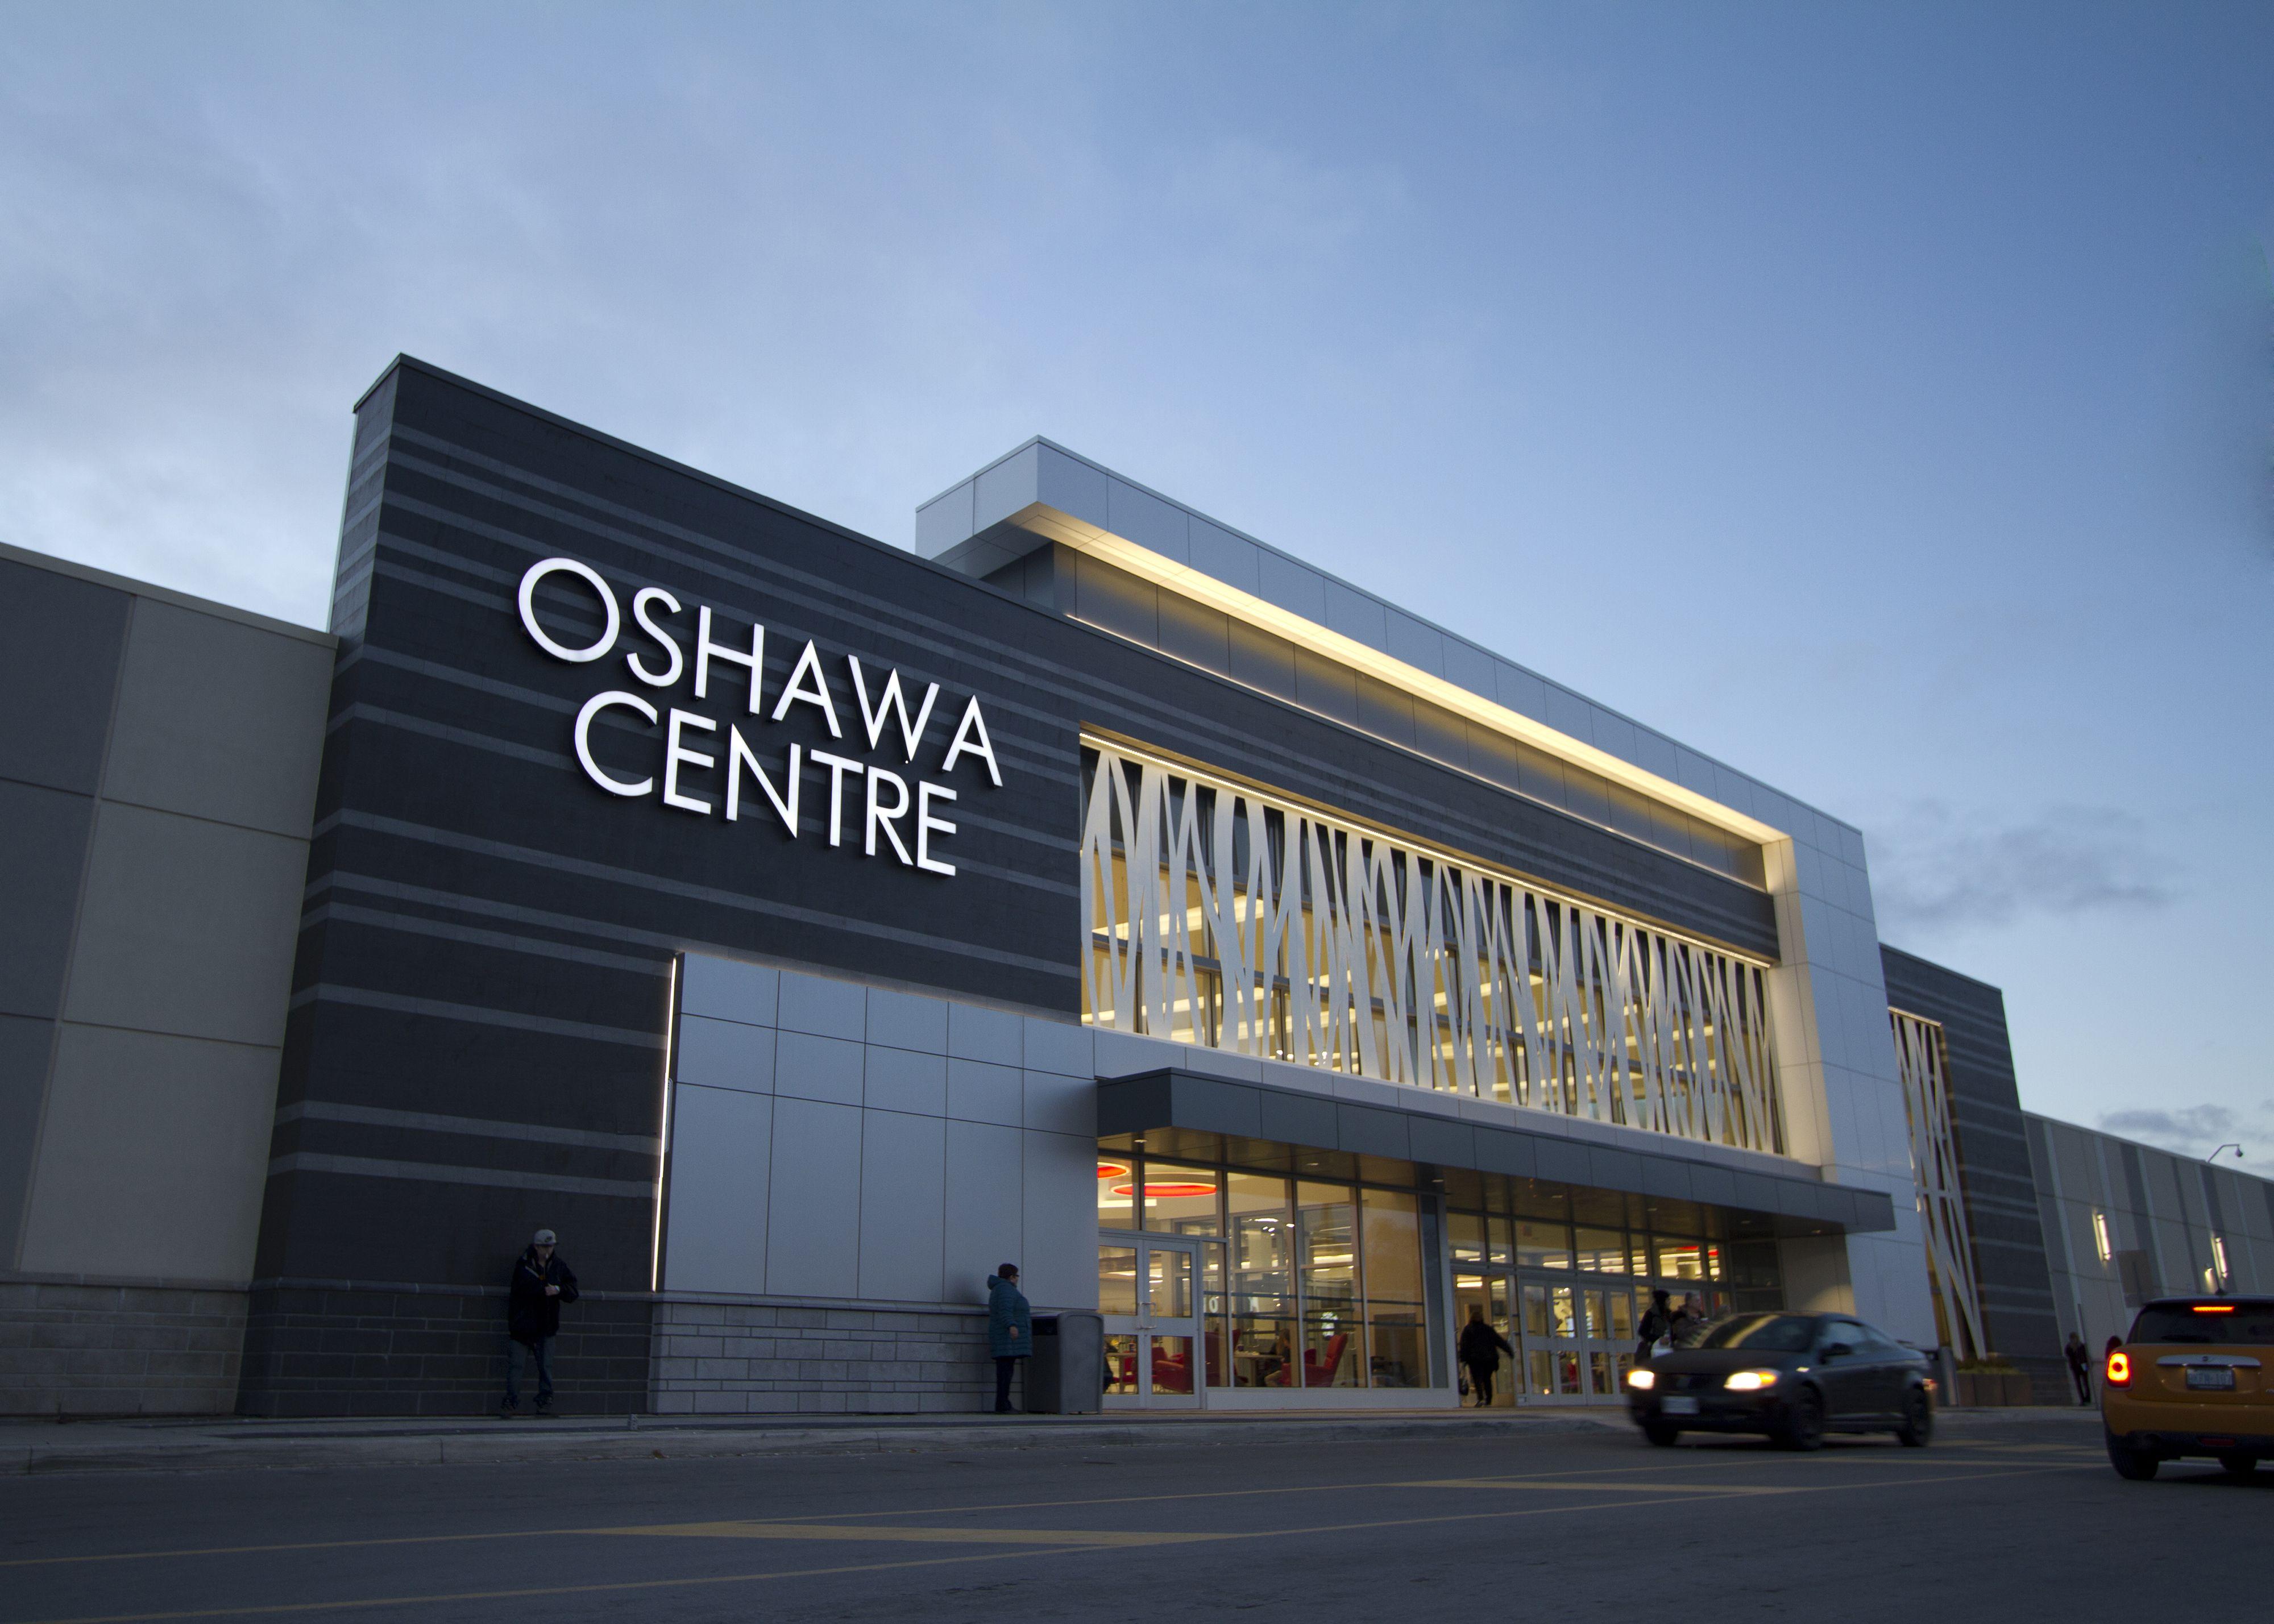 Oshawa Centre Low Rise Retail Exterior Design Retail